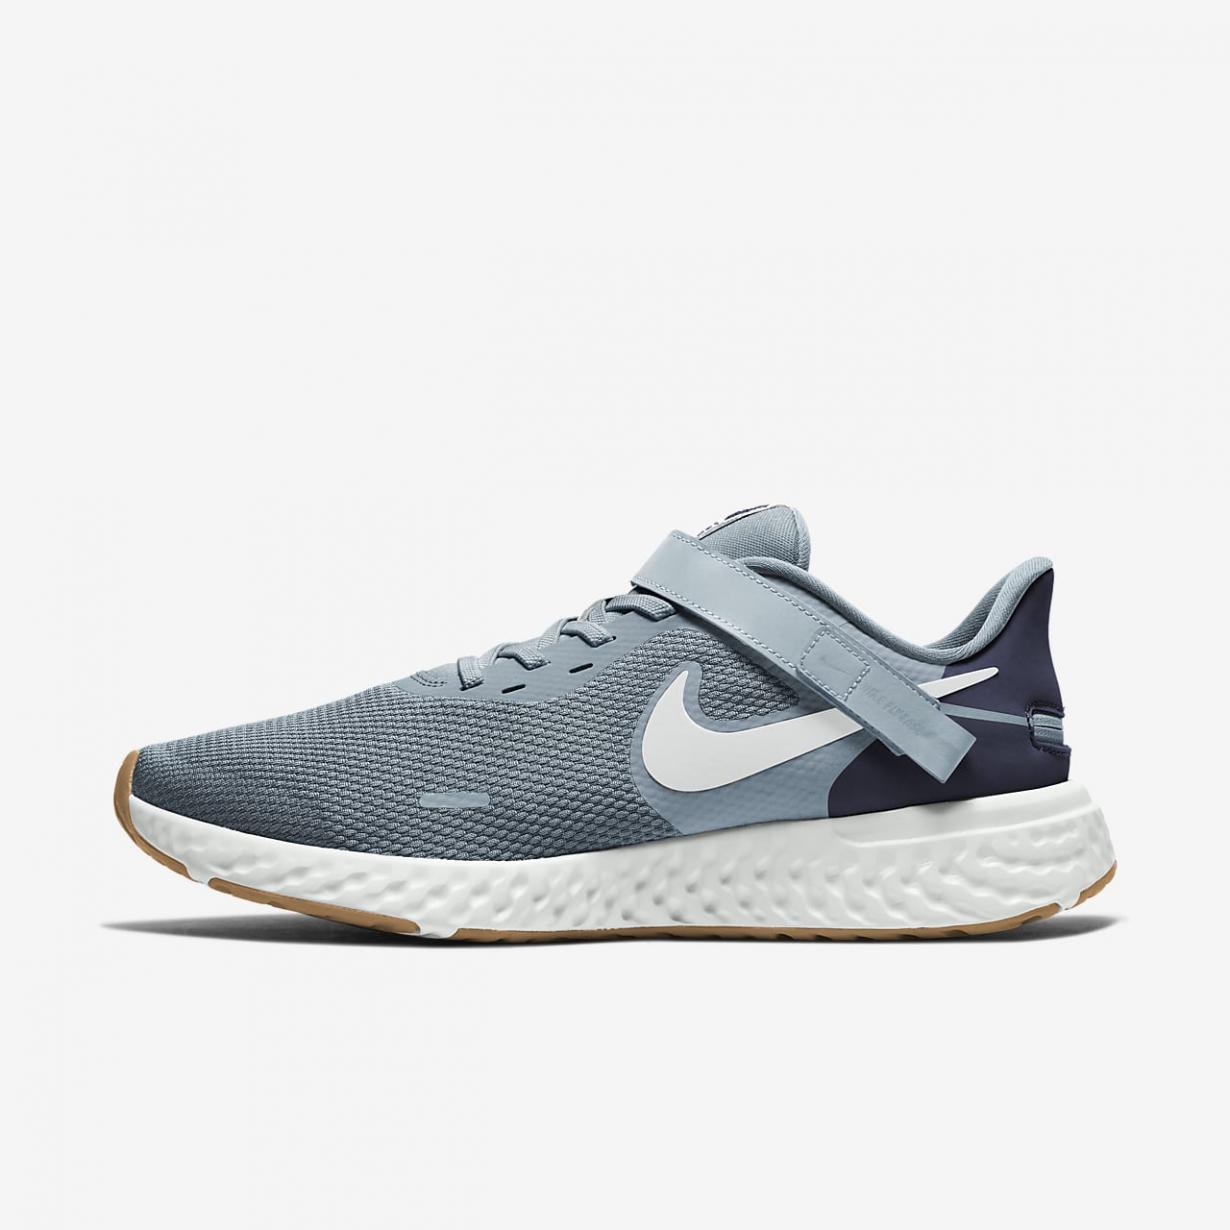 Gomme marron < Nike En Ligne Pas Cher Vente - FR < Gooddaytricities